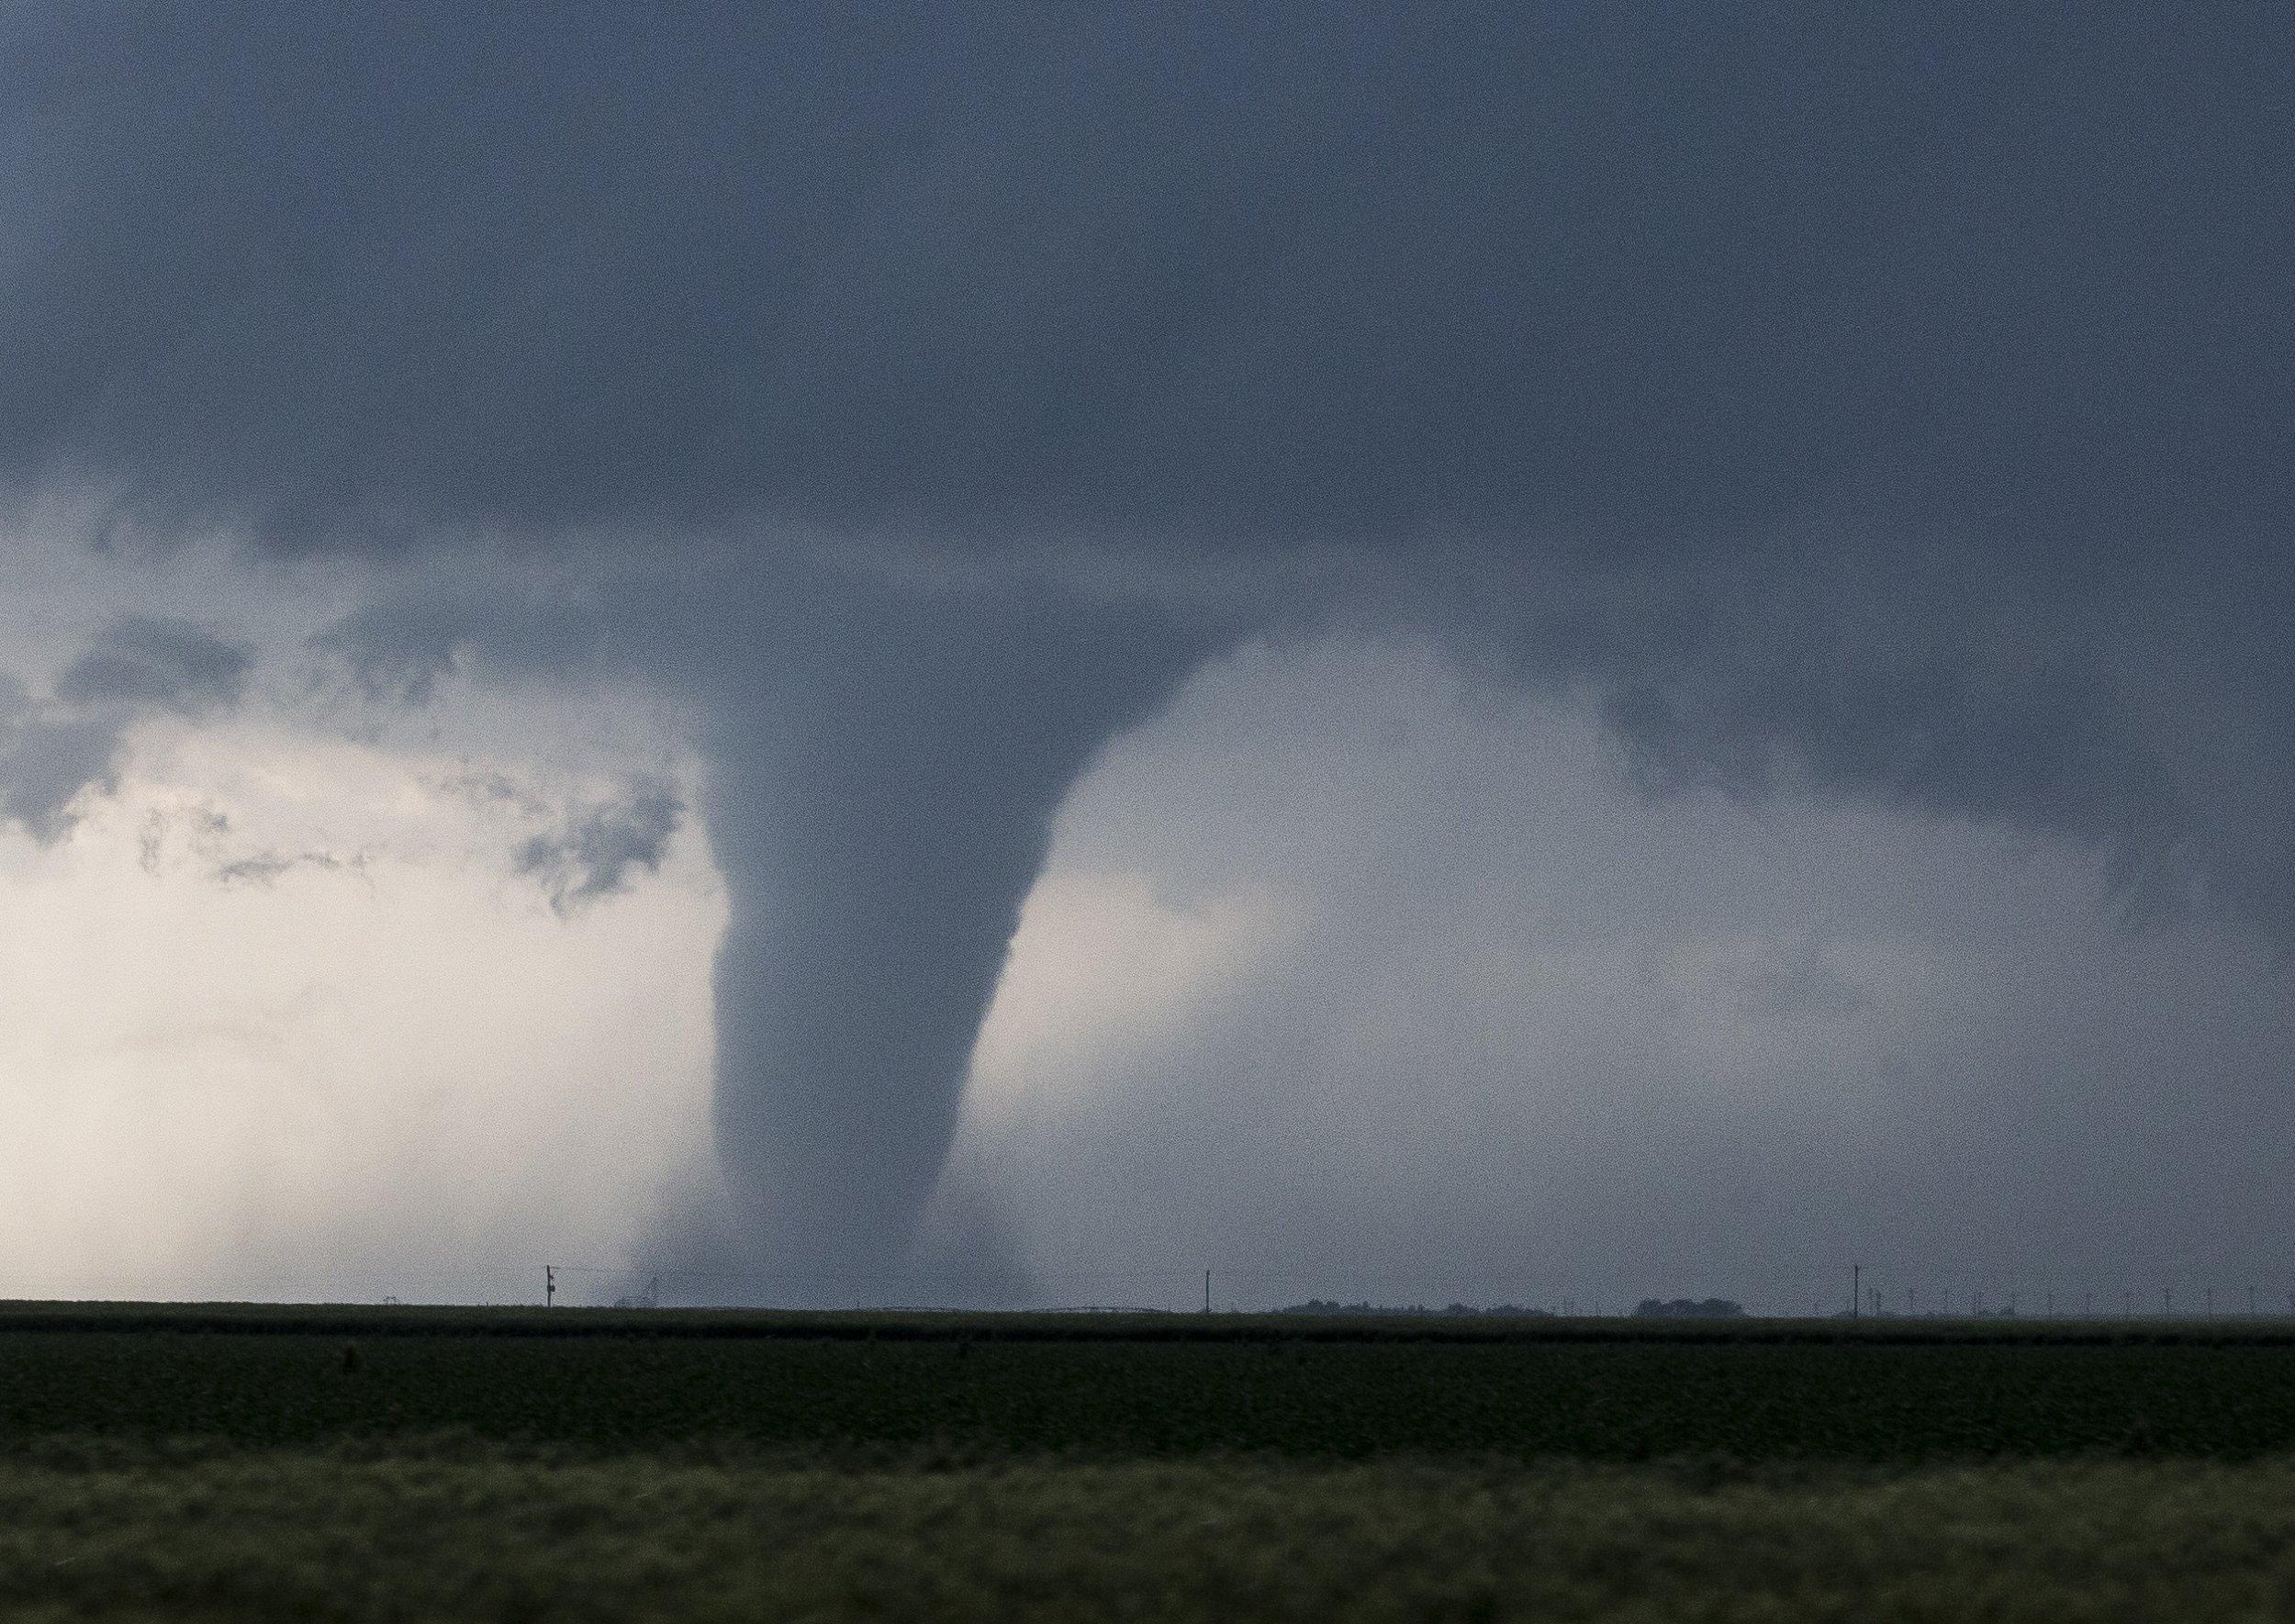 Tornado in Kansas (2016)